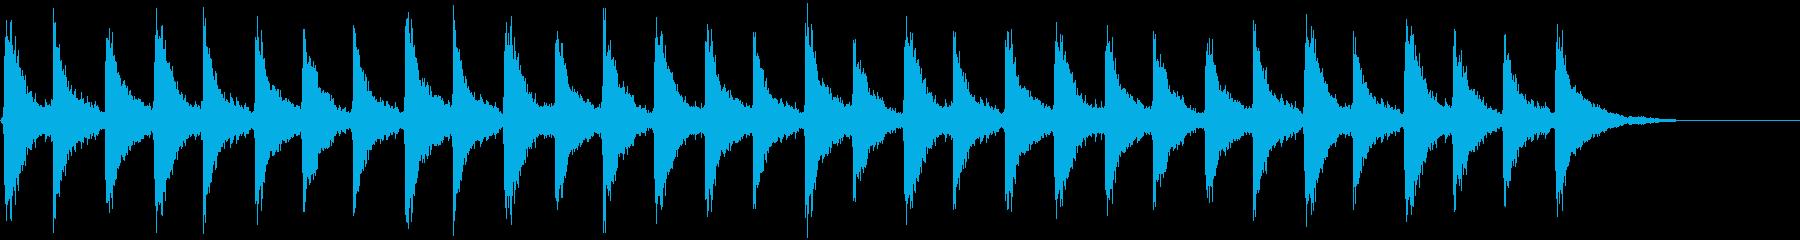 Xmasシーンに最適な鈴の音(遅め)の再生済みの波形